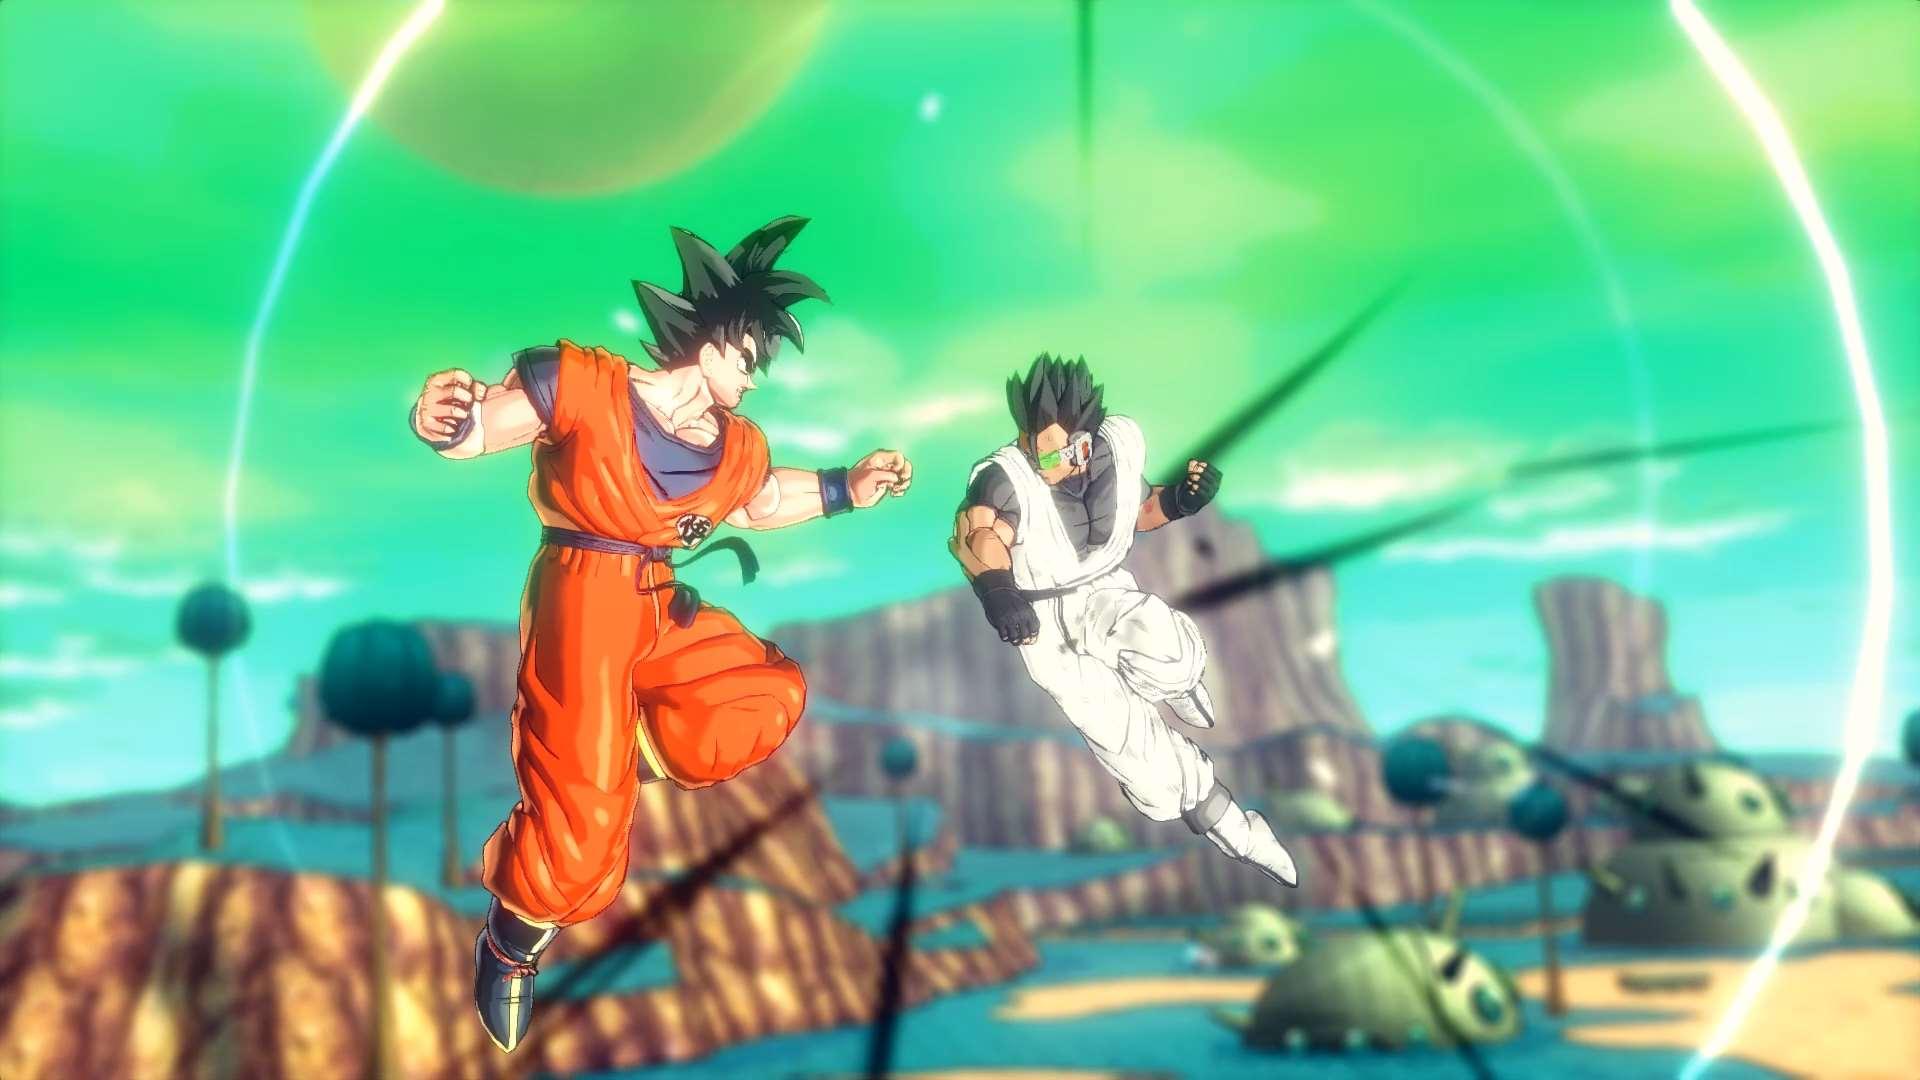 Counter Strike Xbox moreover Dragon Ball Xenoverse  bat Goku Wallpaper furthermore Pet furthermore Thumb Jagd Auf Roter Oktober also Capture. on xbox one